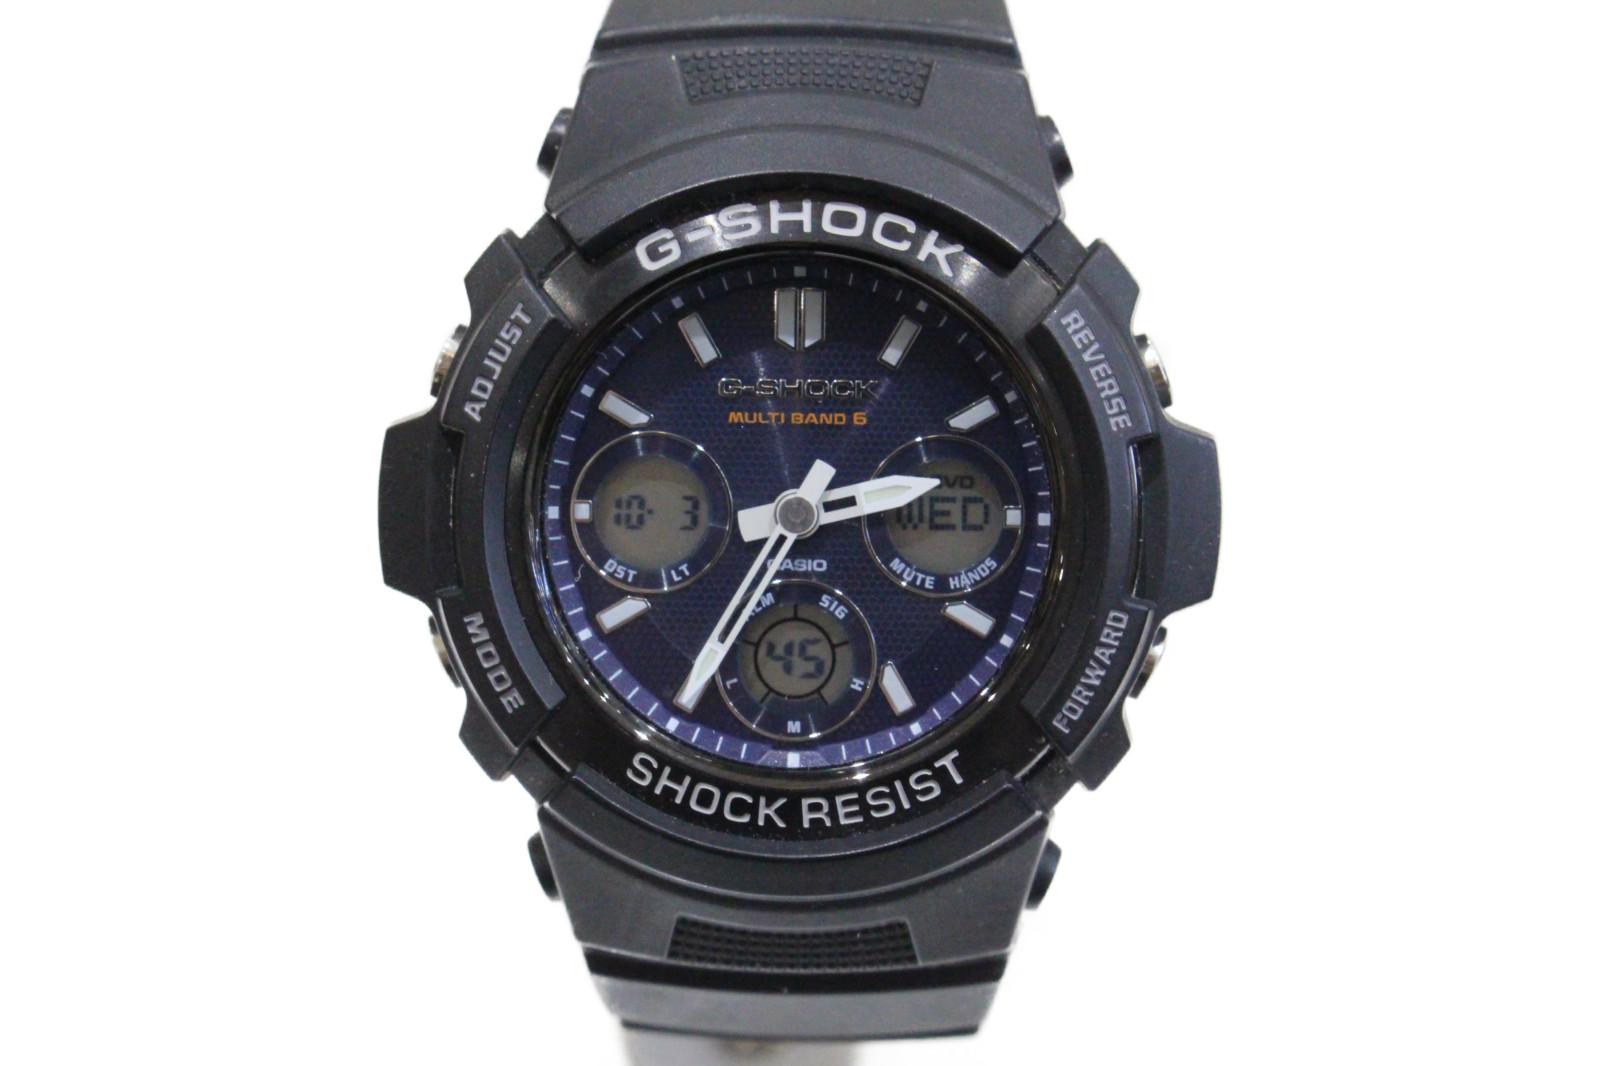 CASIO カシオ G-SHOCK ジーショック ベーシック AWG-M100SB-2AJF デジタル アナログ ラバー ブラック ブルー メンズ 腕時計【中古】